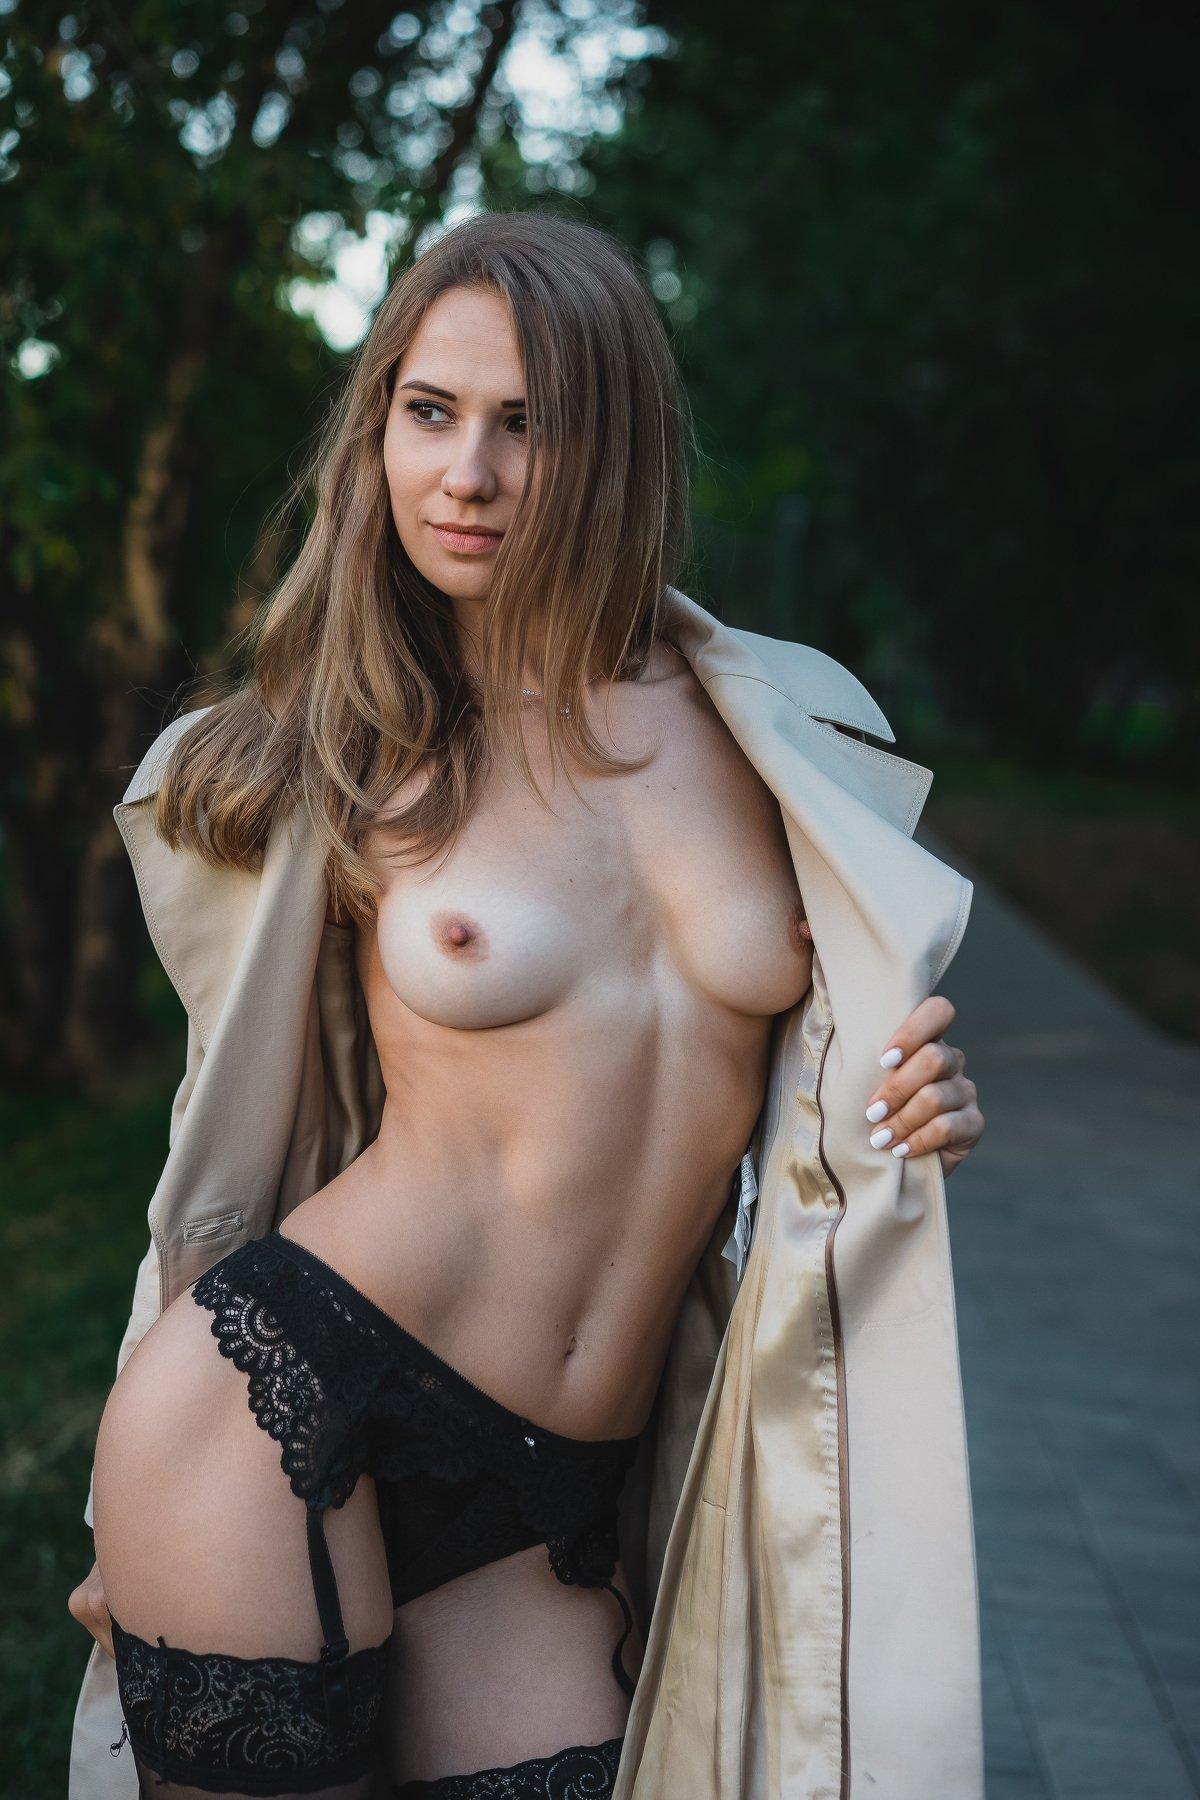 topless girl moscowcity pretty nude, Пистолетов Илья